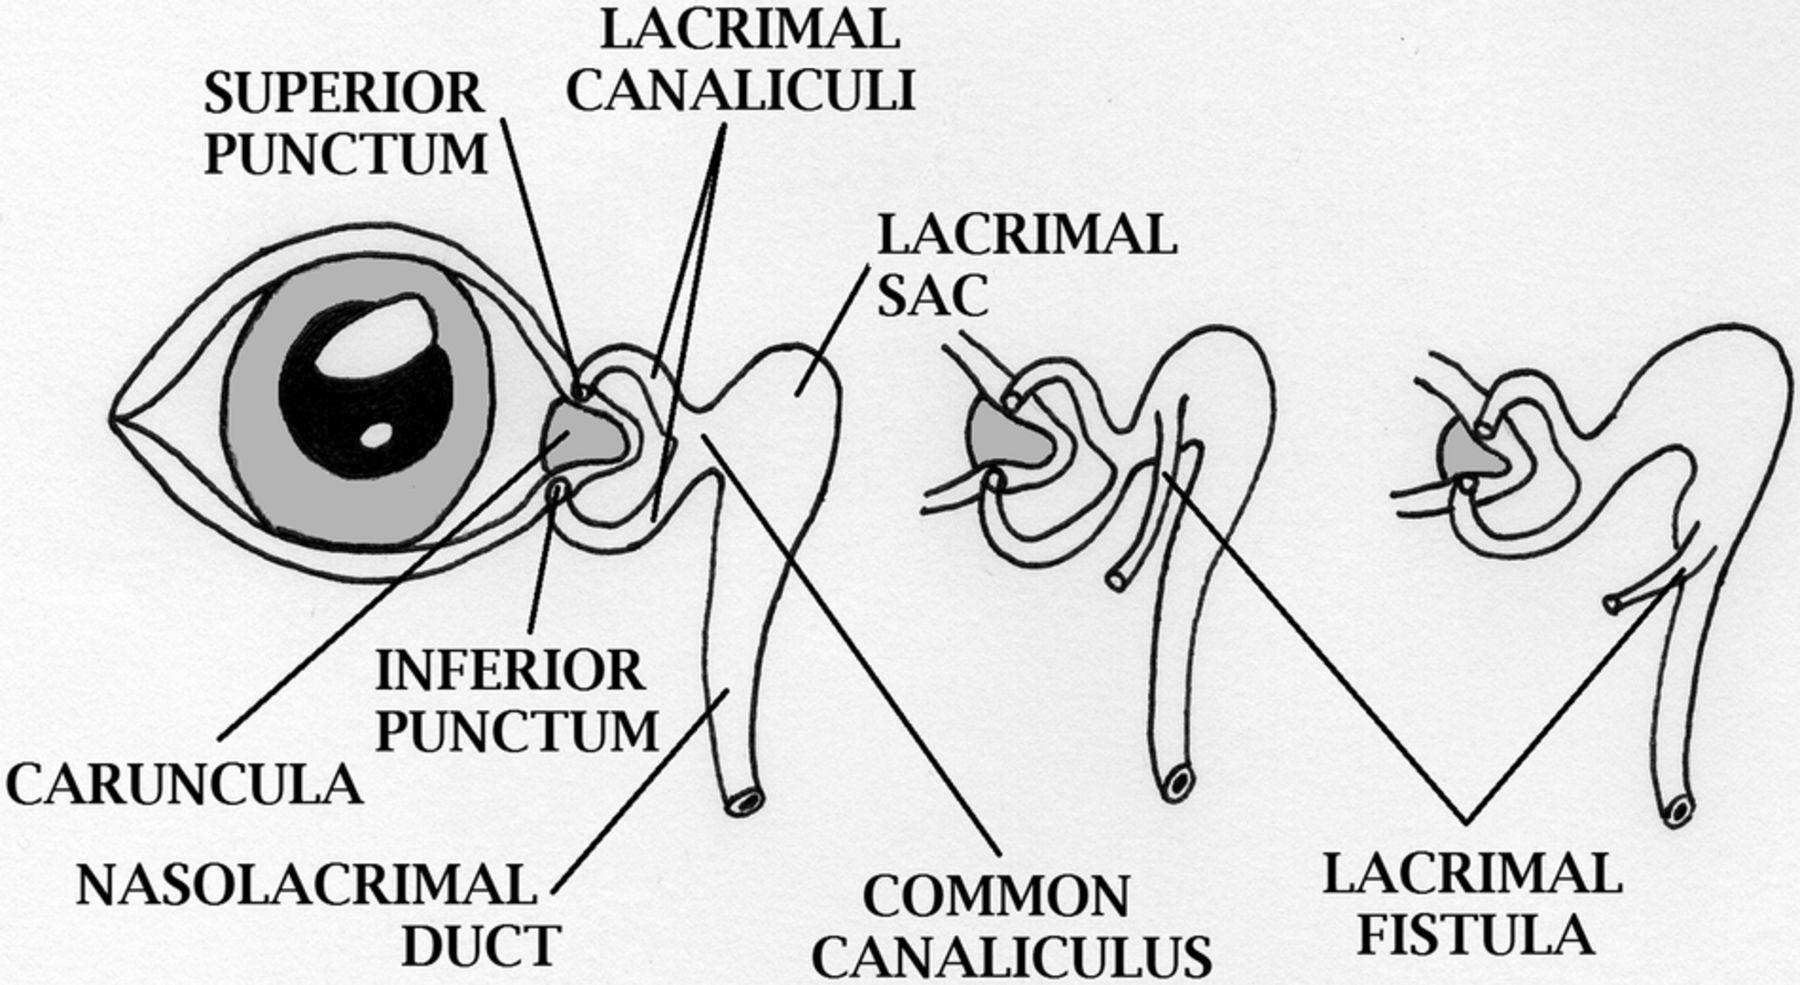 Congenital lacrimal fistula | ADC Fetal & Neonatal Edition